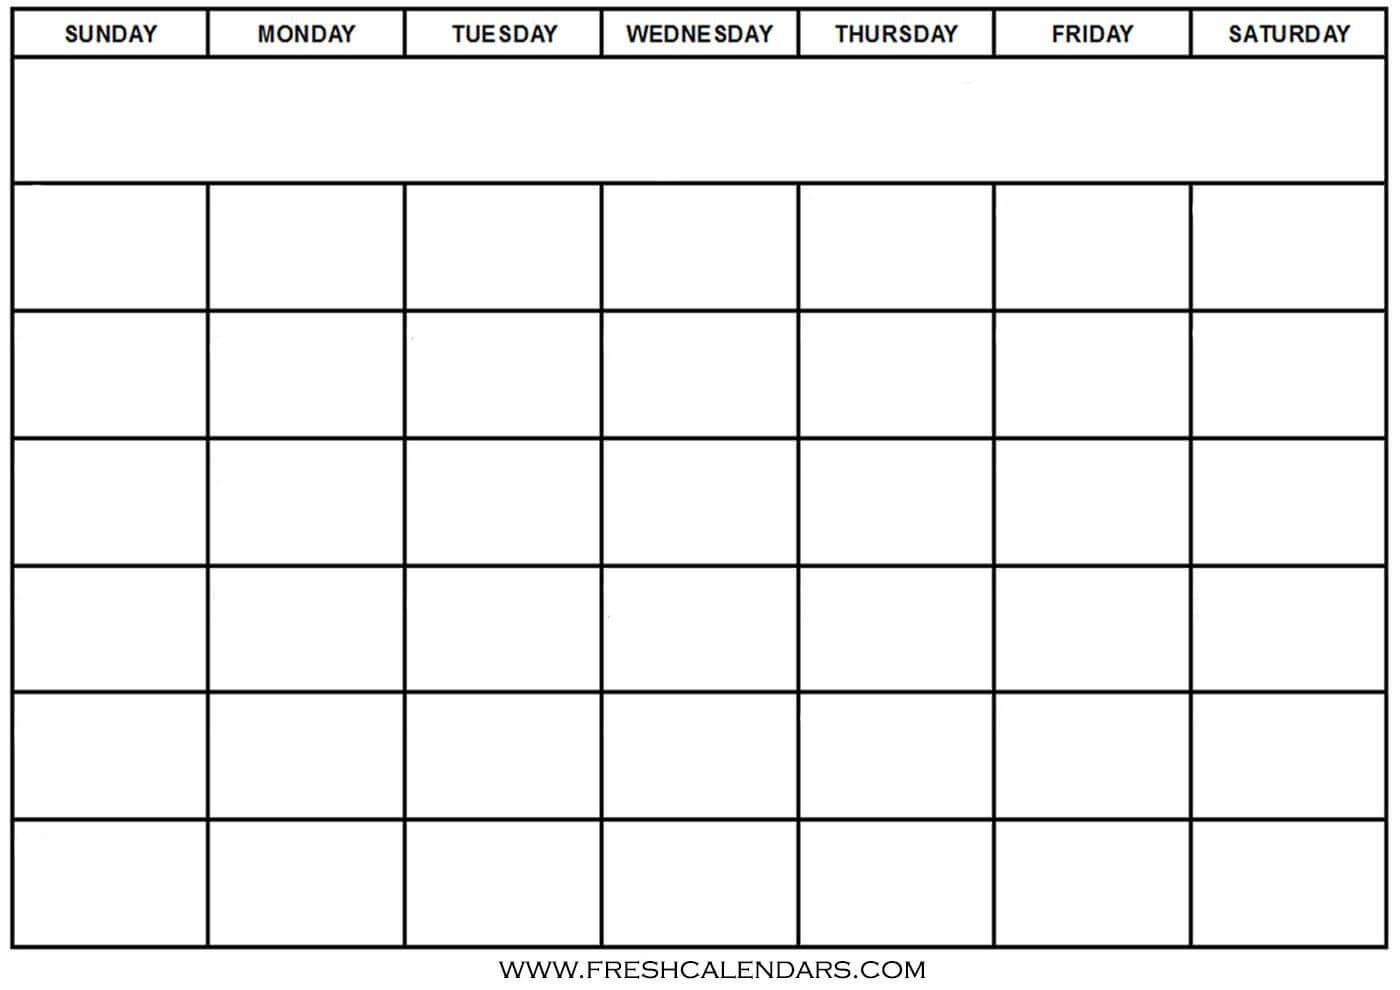 30 Print Free Calendar Template | Andaluzseattle Template within Full Page Blank Calendar Template